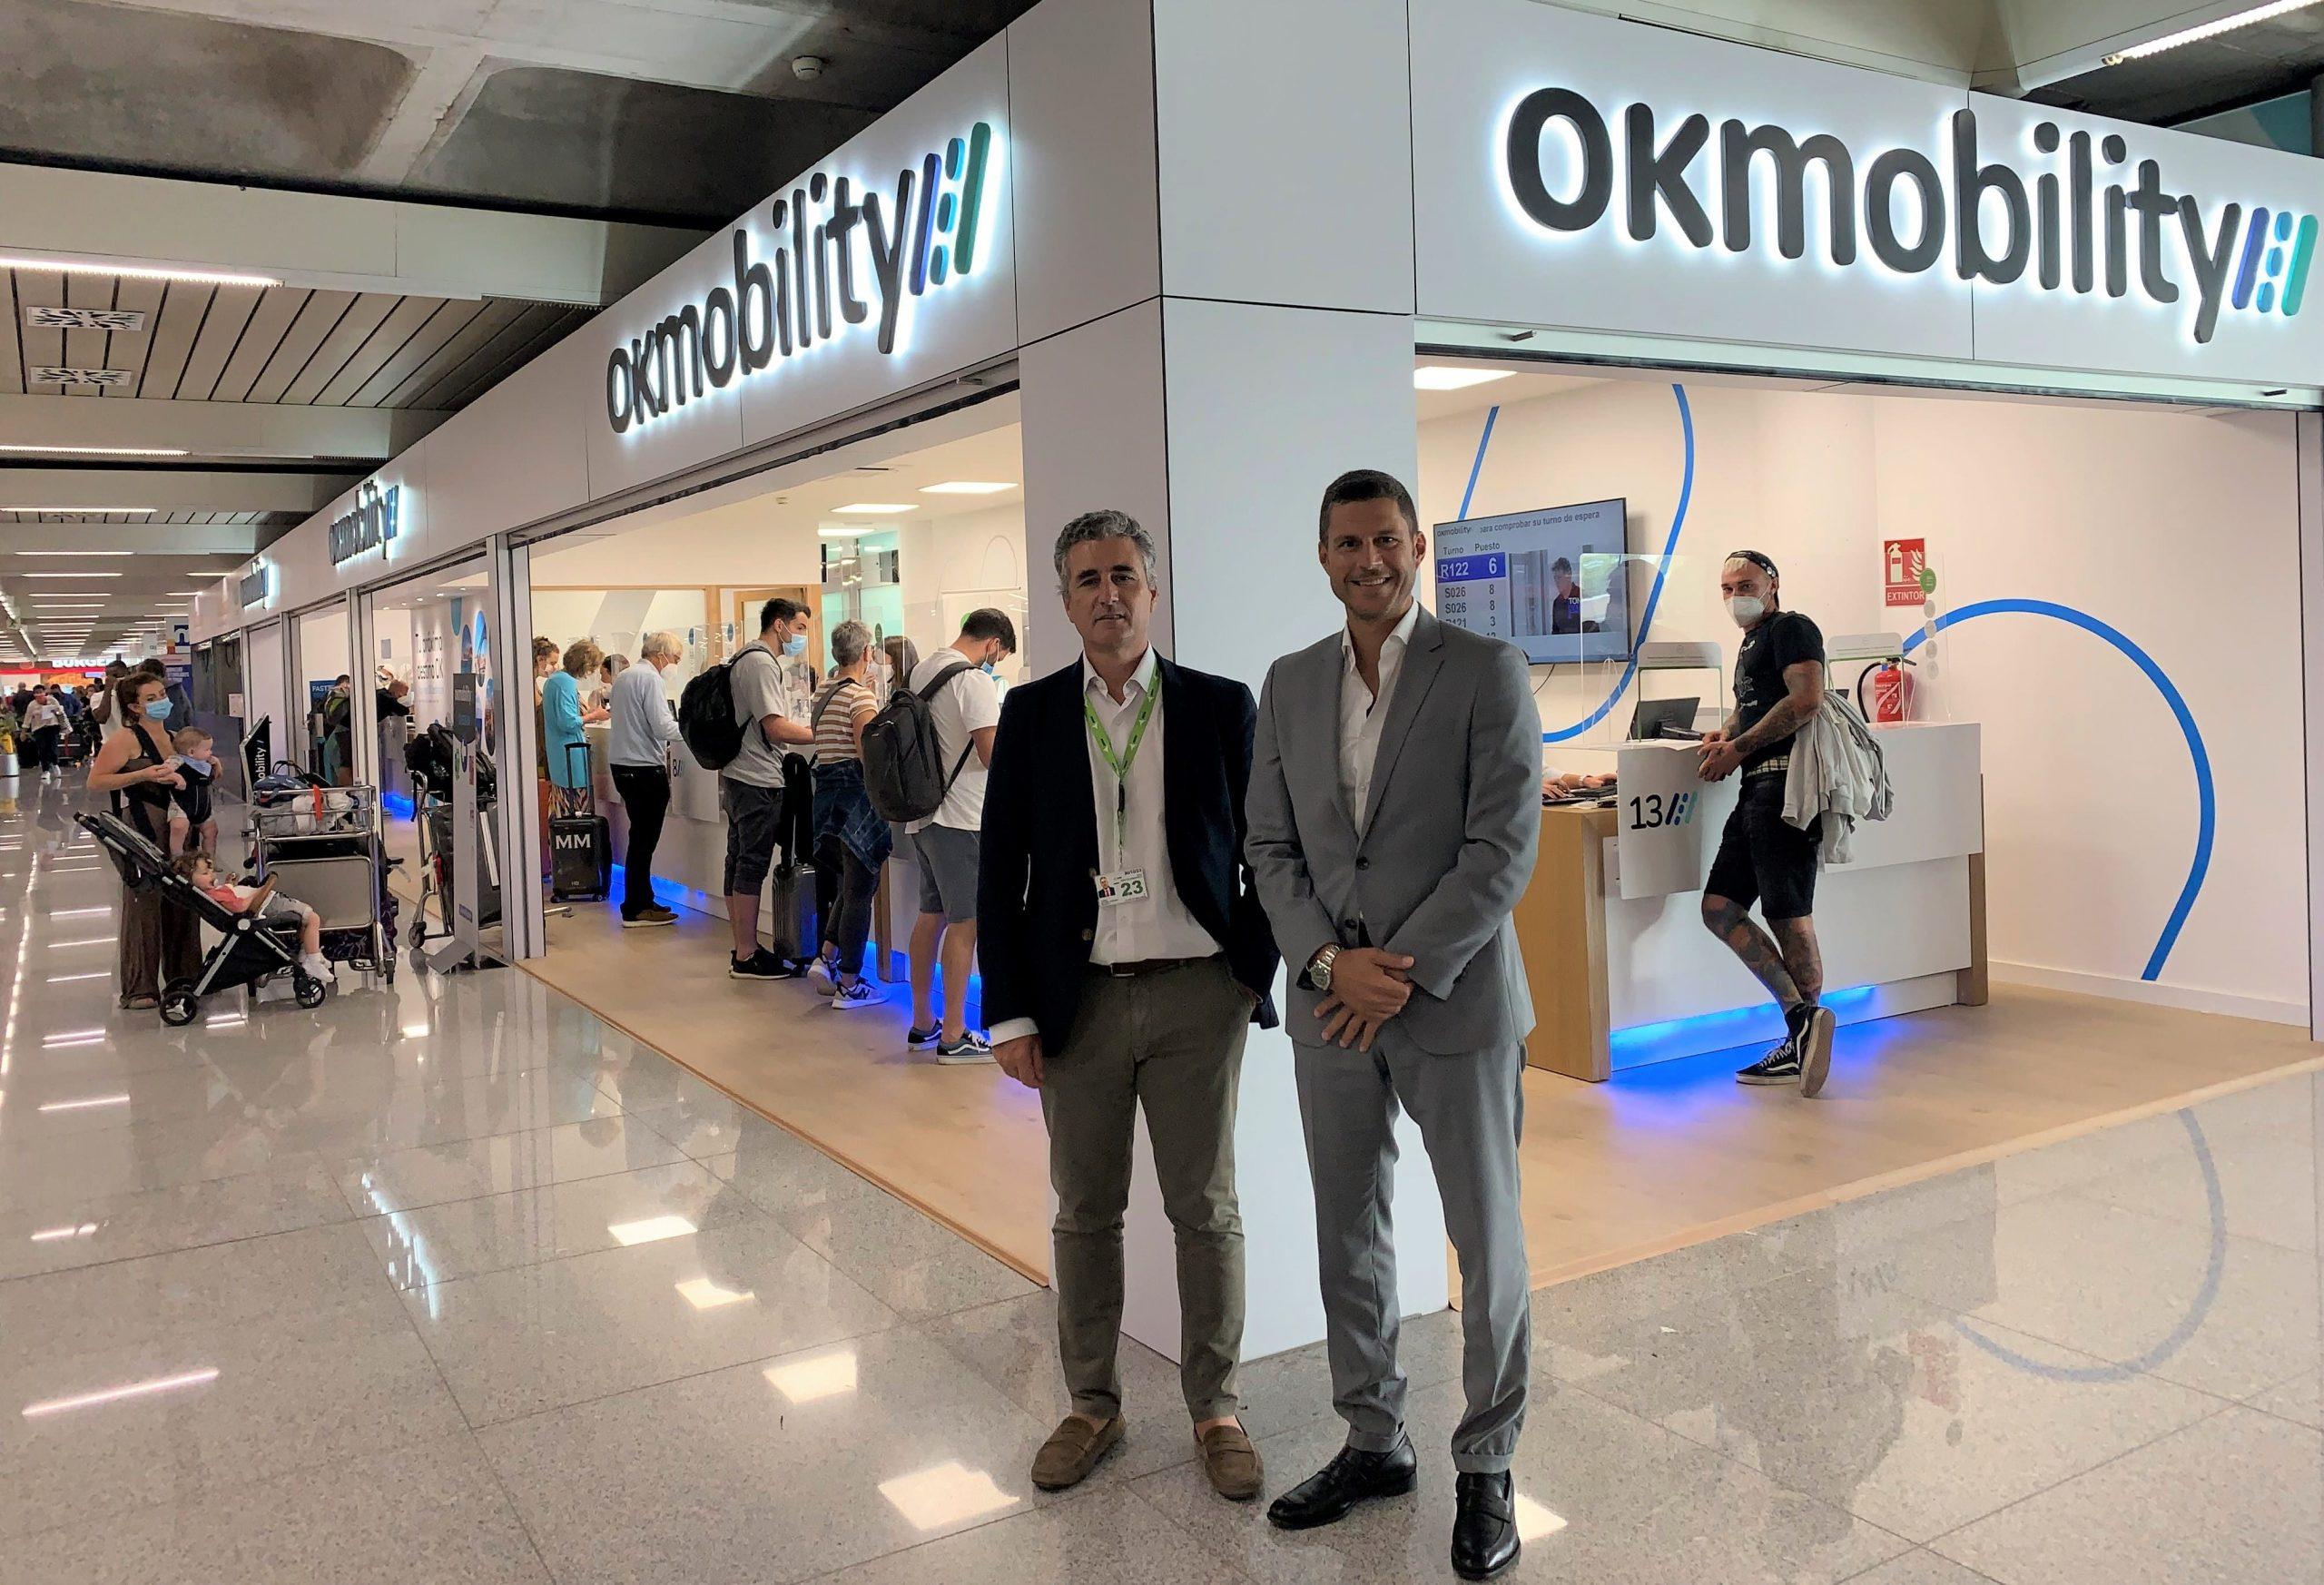 OK Mobility opera ya dentro del Aeropuerto de Palma